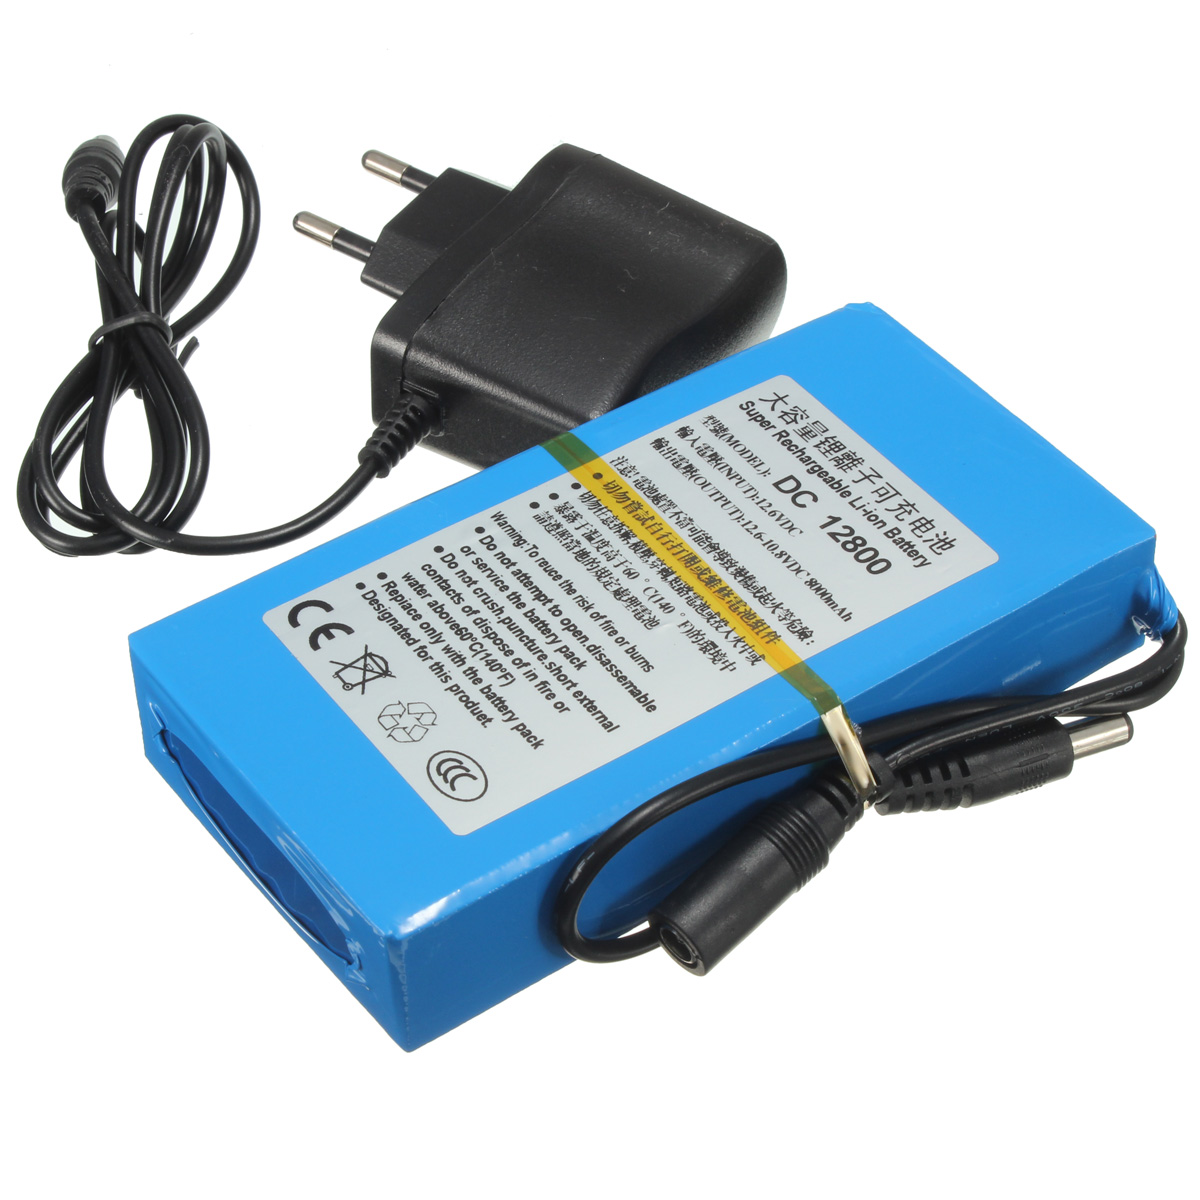 20000mah batterie dc 12v rechargeable lithium ion li ion eu plug chargeur power. Black Bedroom Furniture Sets. Home Design Ideas